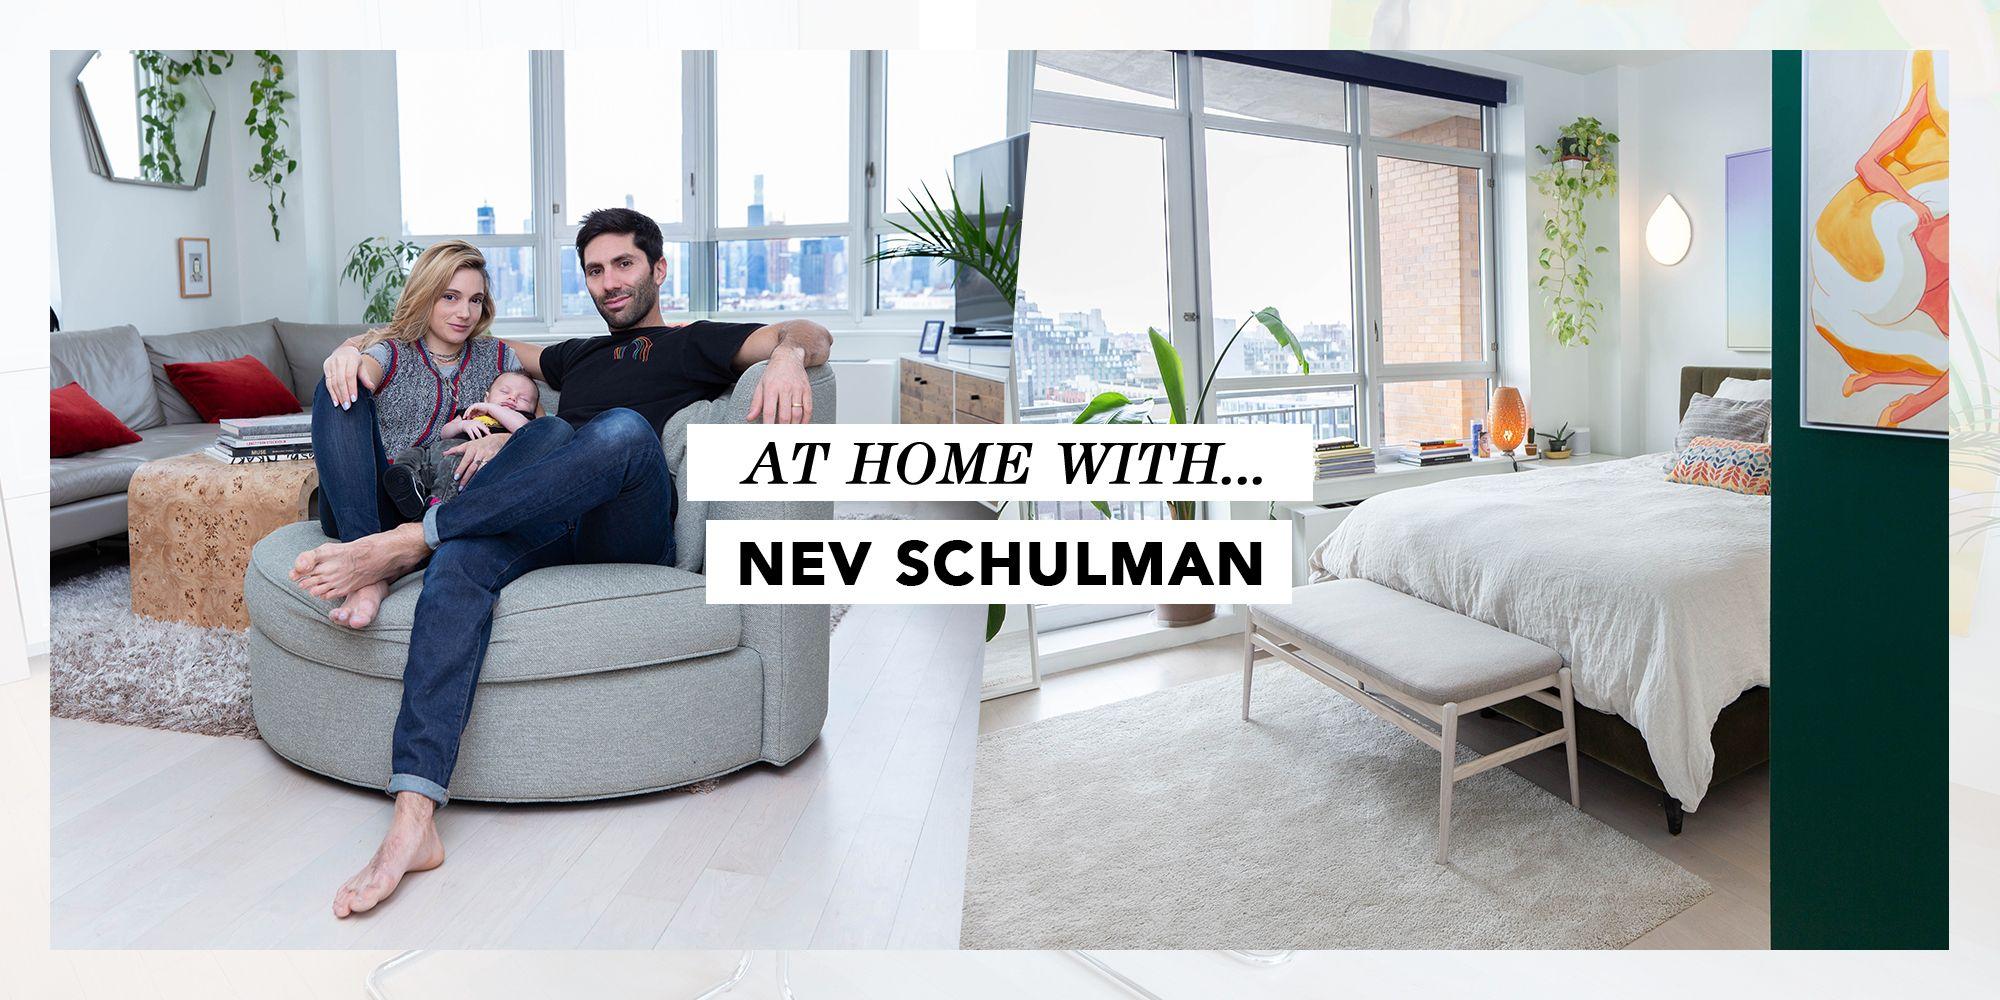 Nev Schulmans Hus i Brooklyn